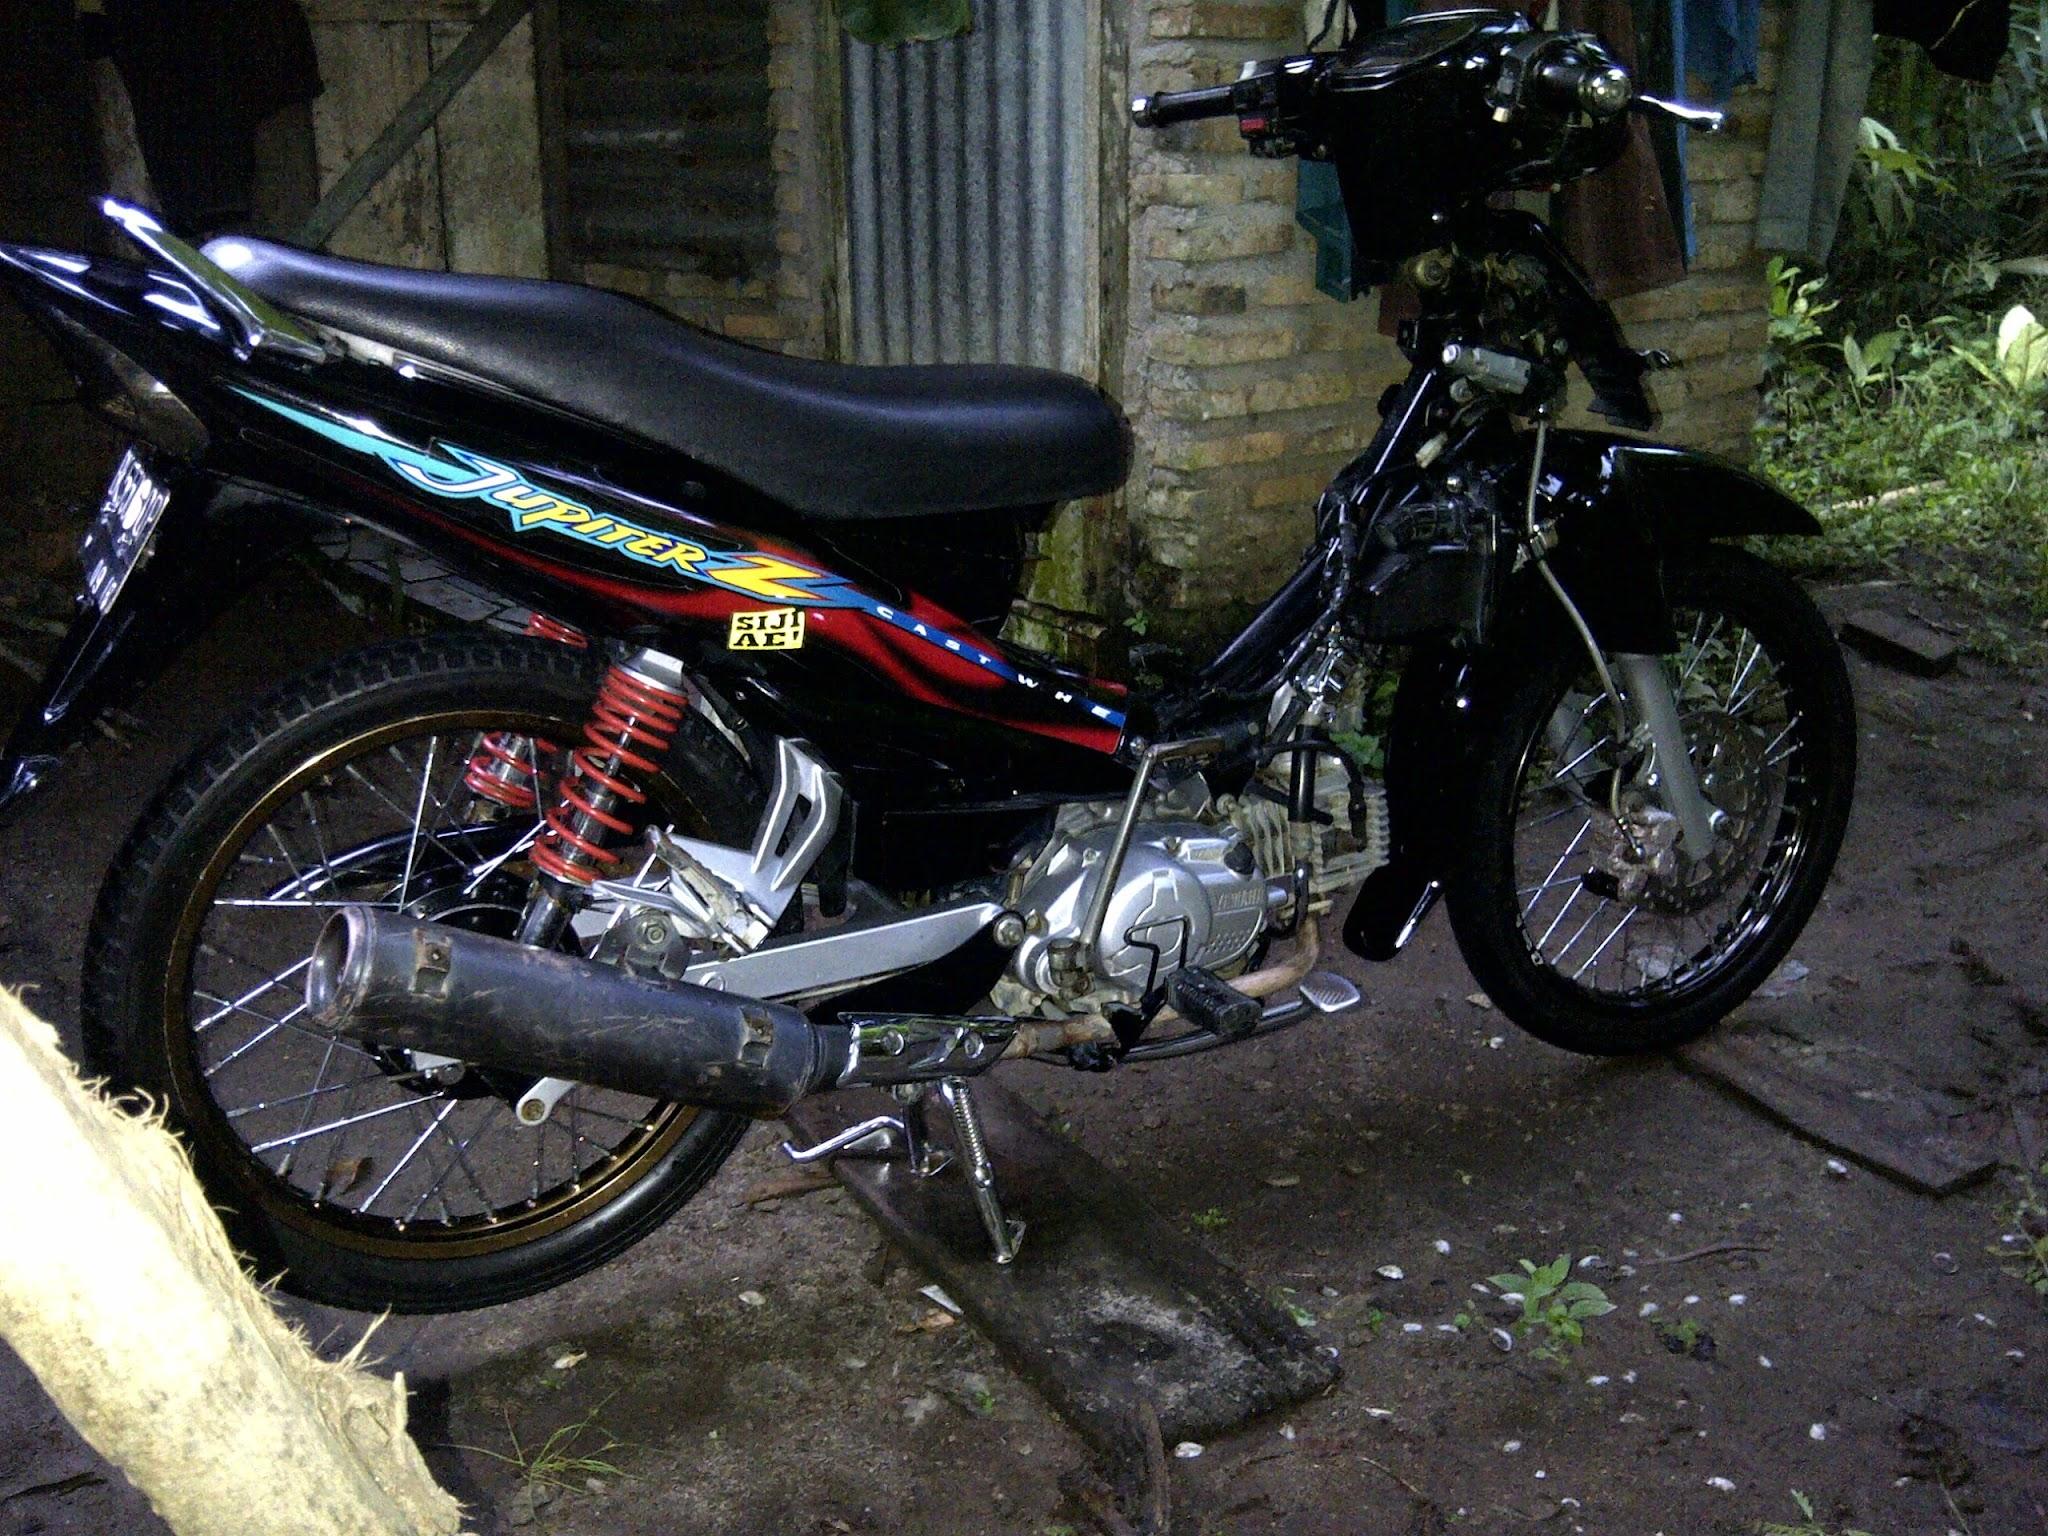 Modif Yamaha Jupiter Lama